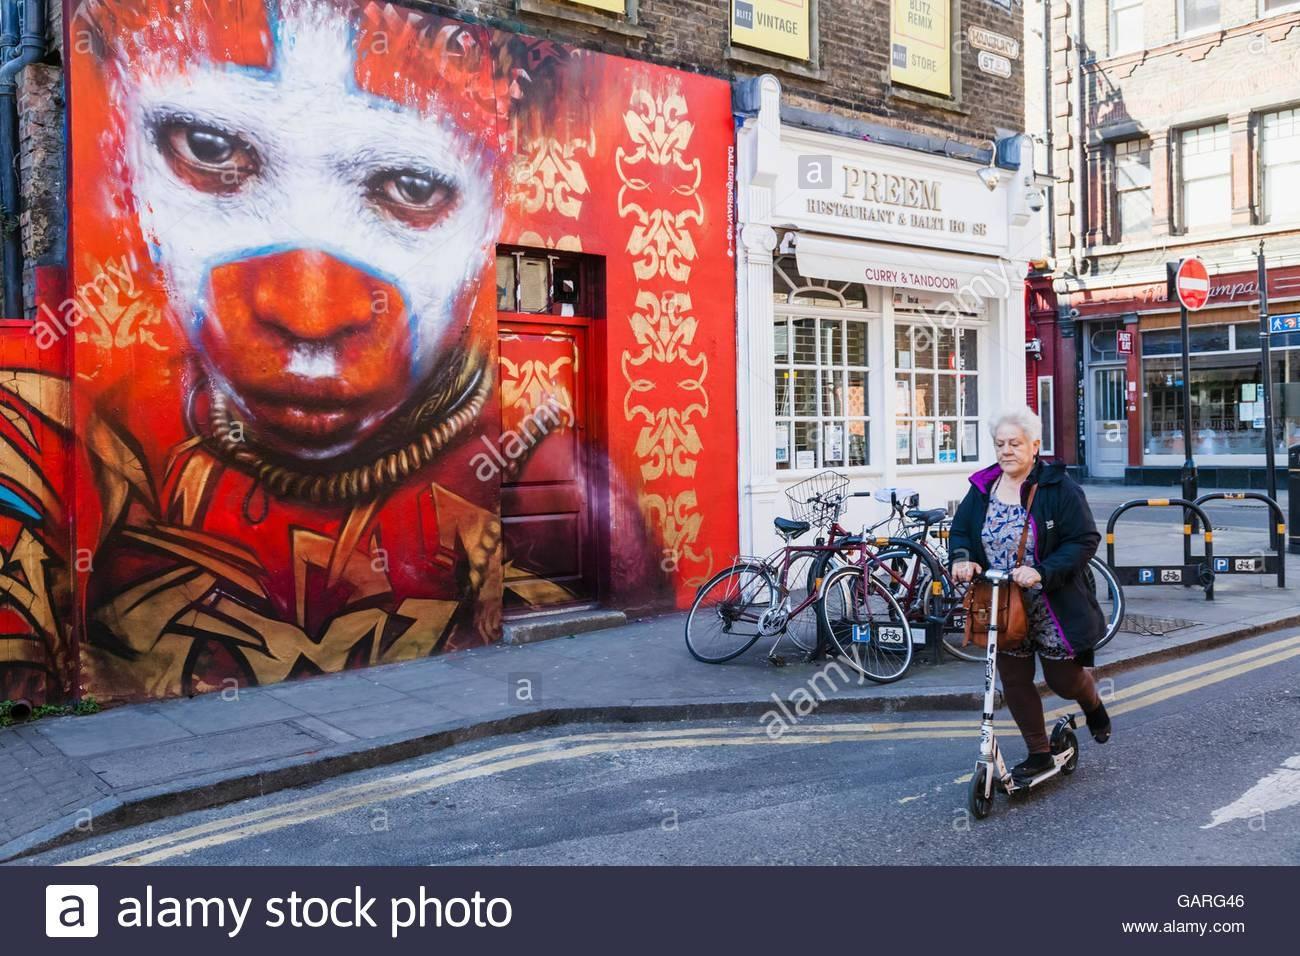 England, London, Shoreditch, Street Scene With Wall Art Stock Regarding Most Current London Scene Wall Art (View 11 of 20)